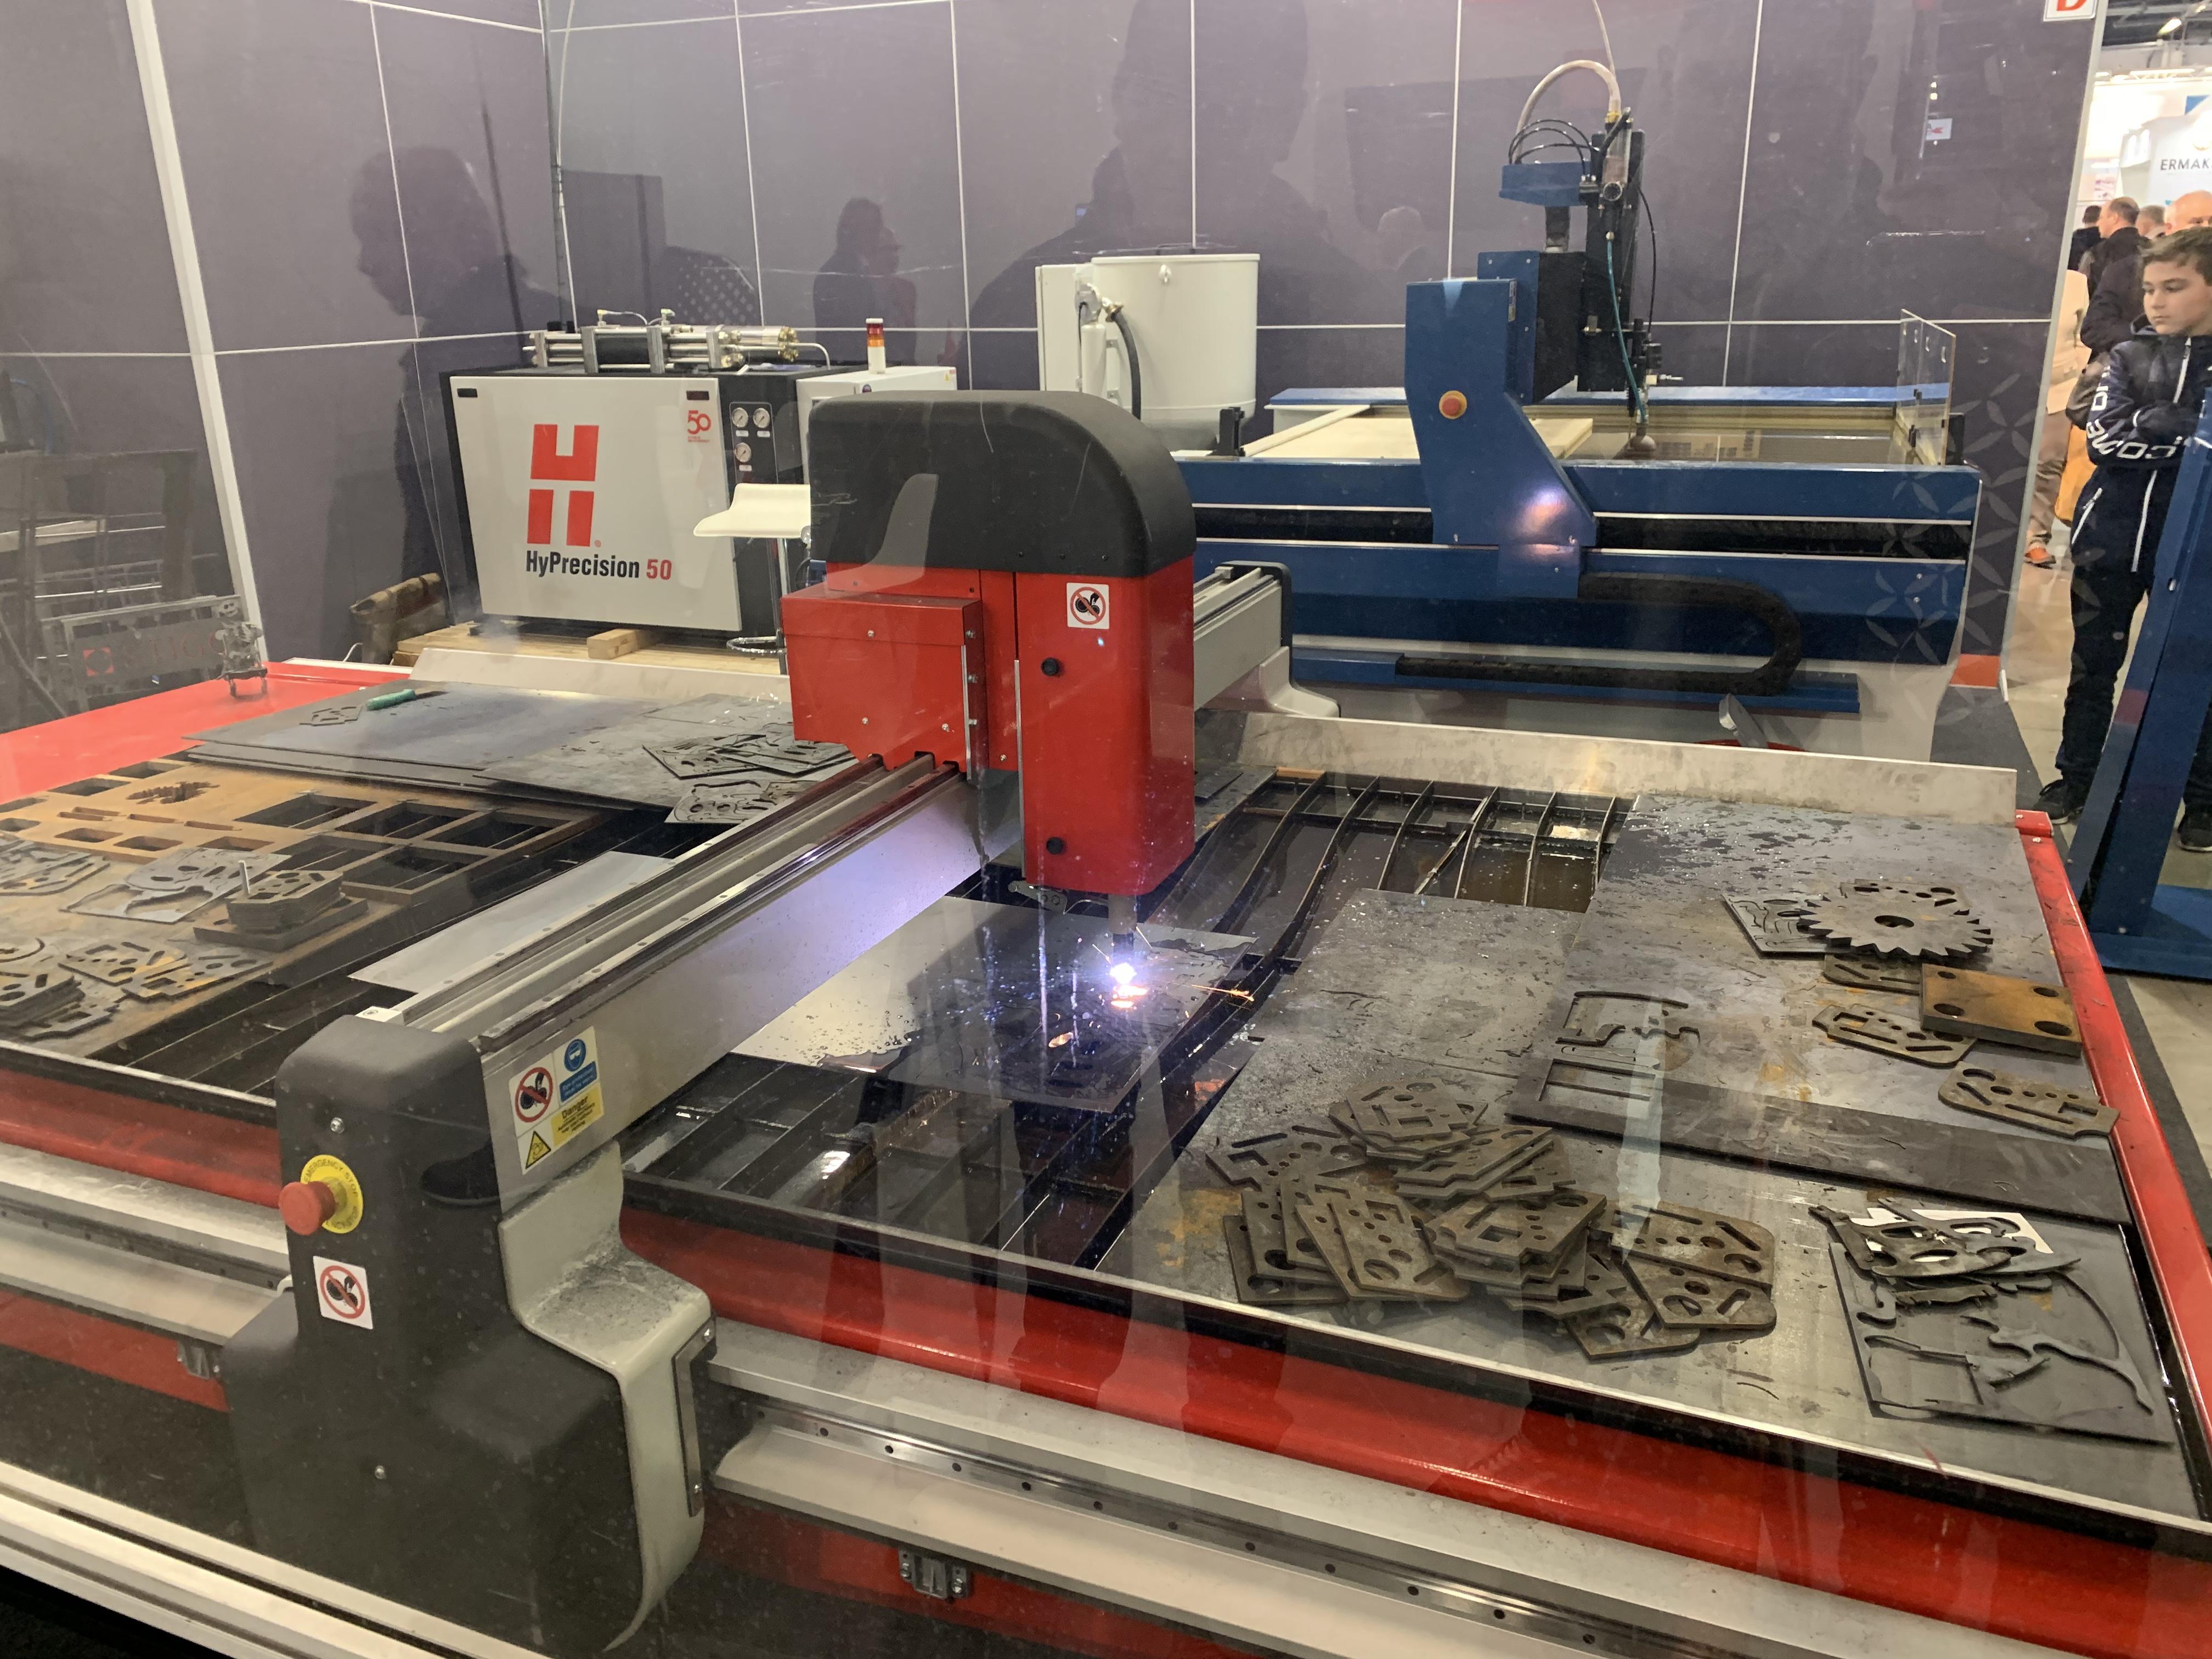 Targi Elektroniki i Automatyki, Tool/Blech&Cutting/Robotics/Laser